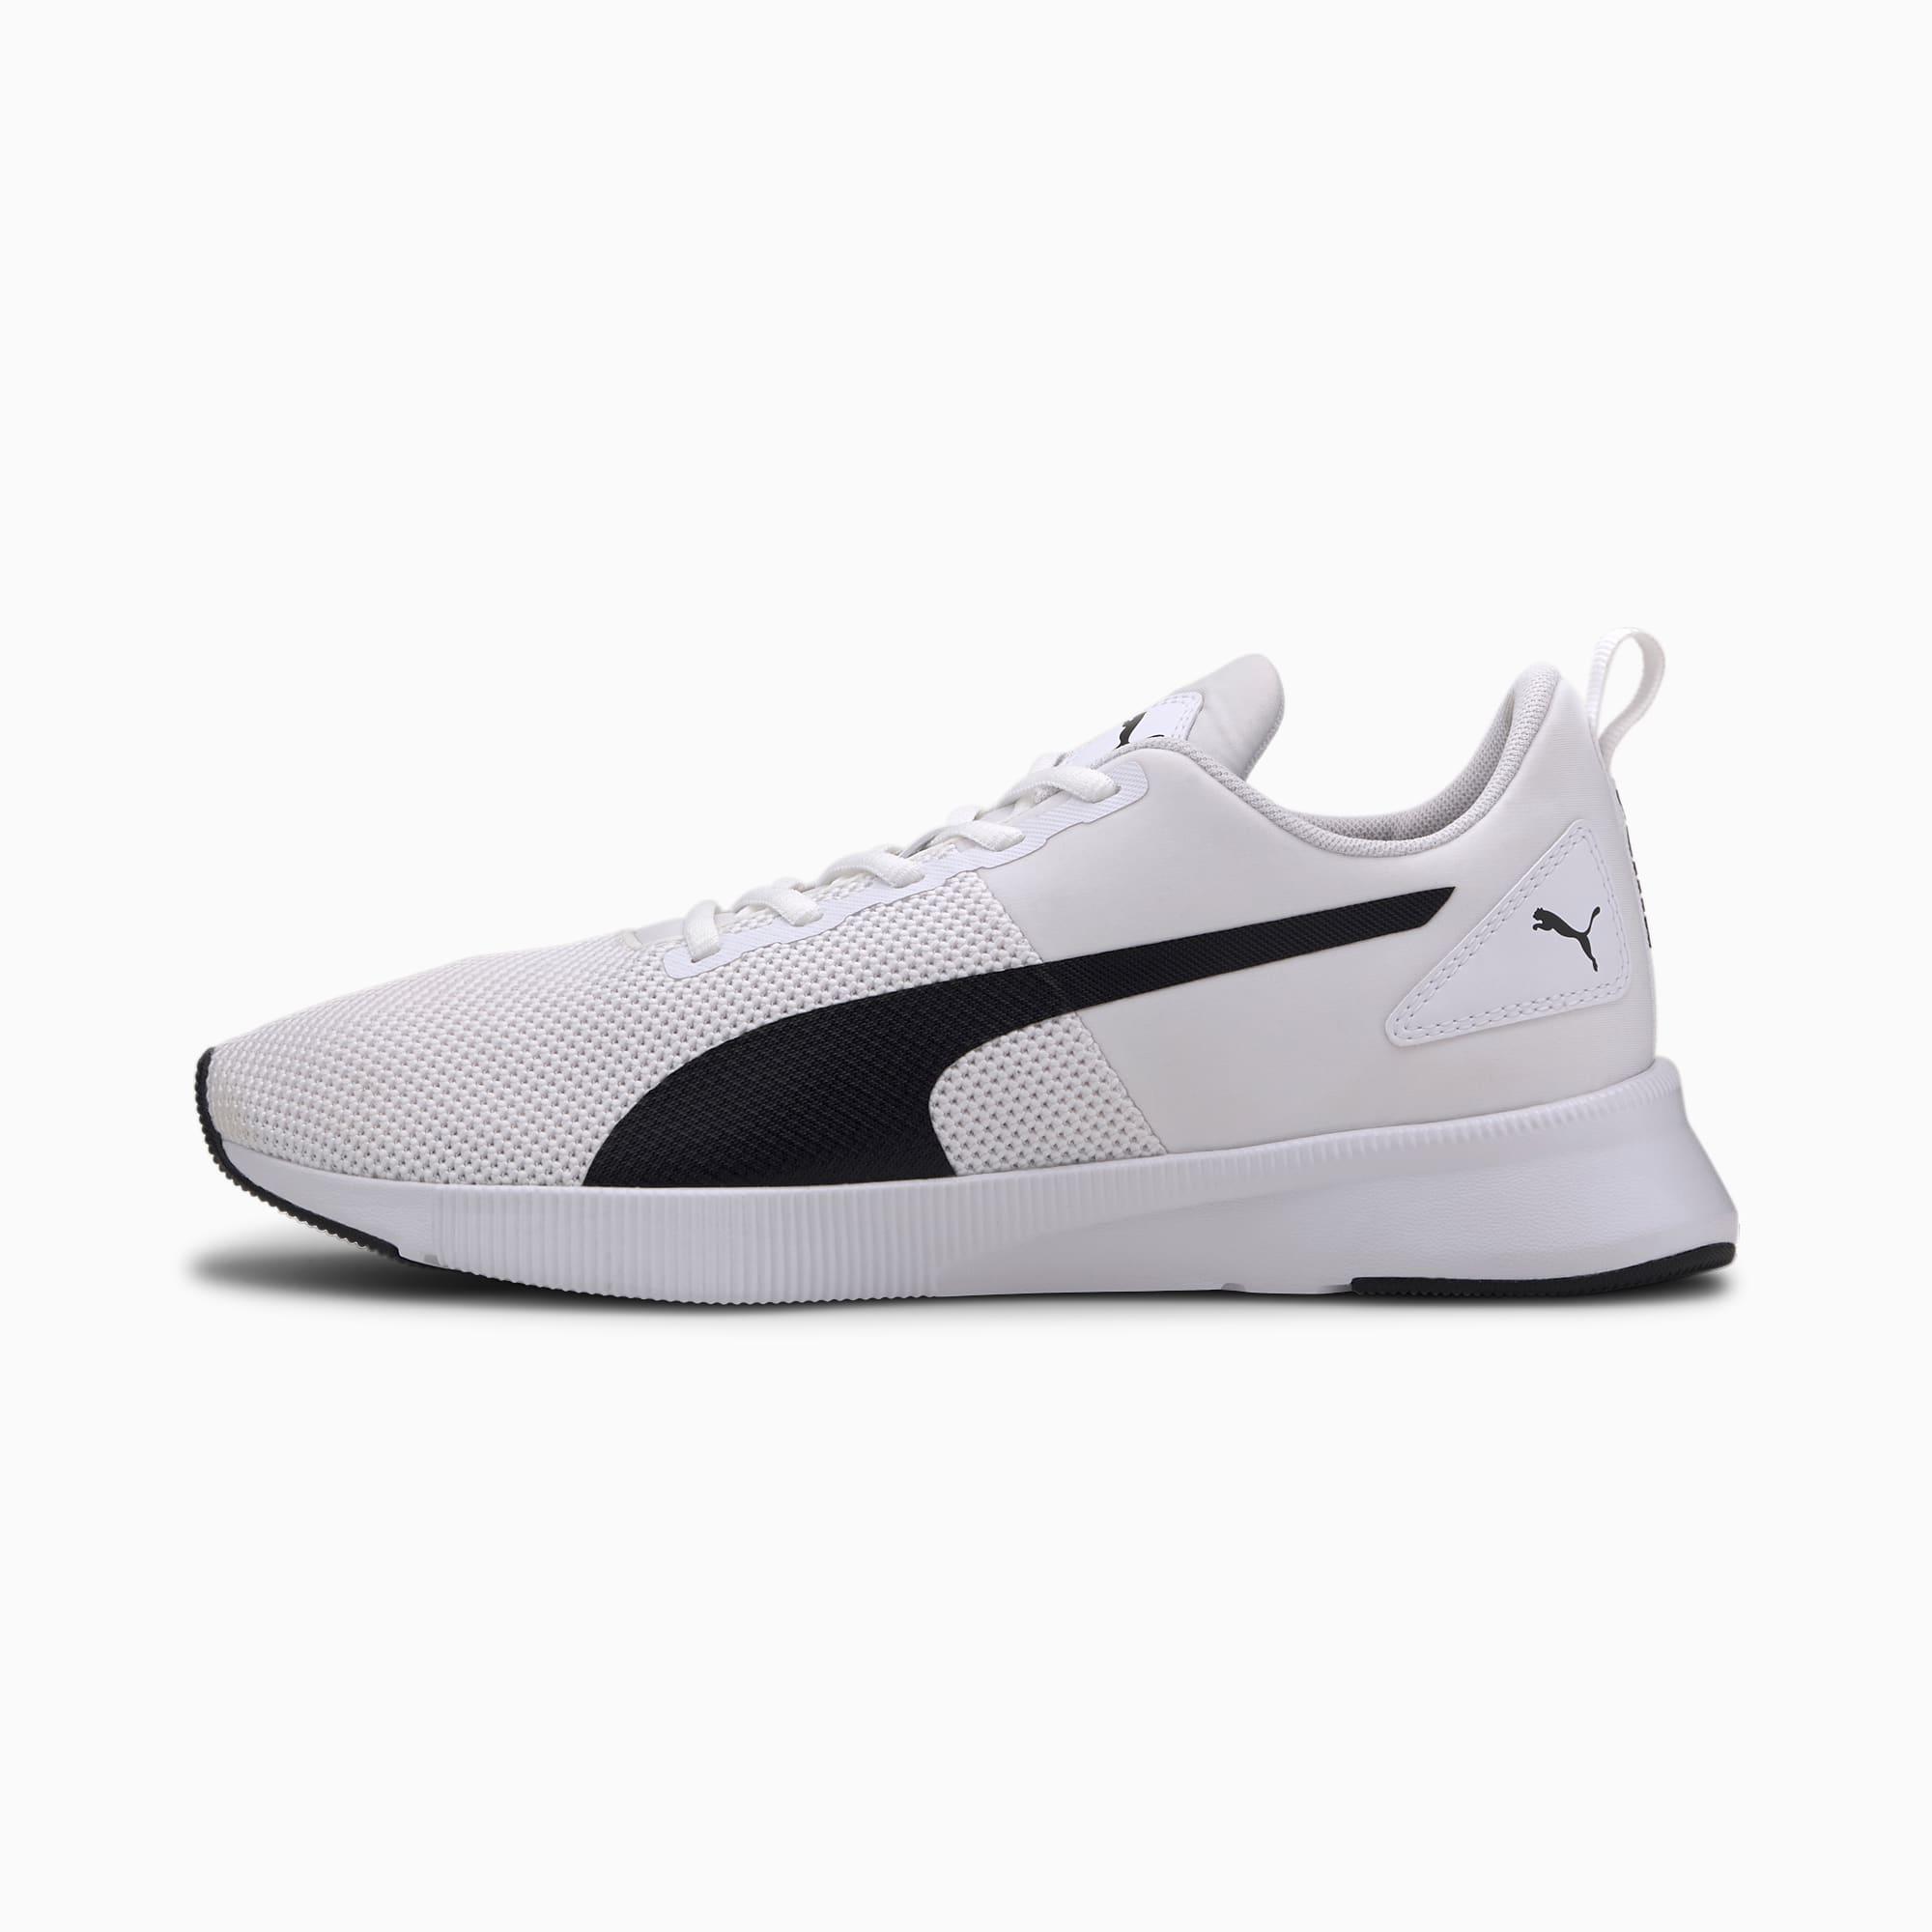 PUMA Chaussure de course Flyer Runner, Blanc/Noir, Taille 39, Chaussures